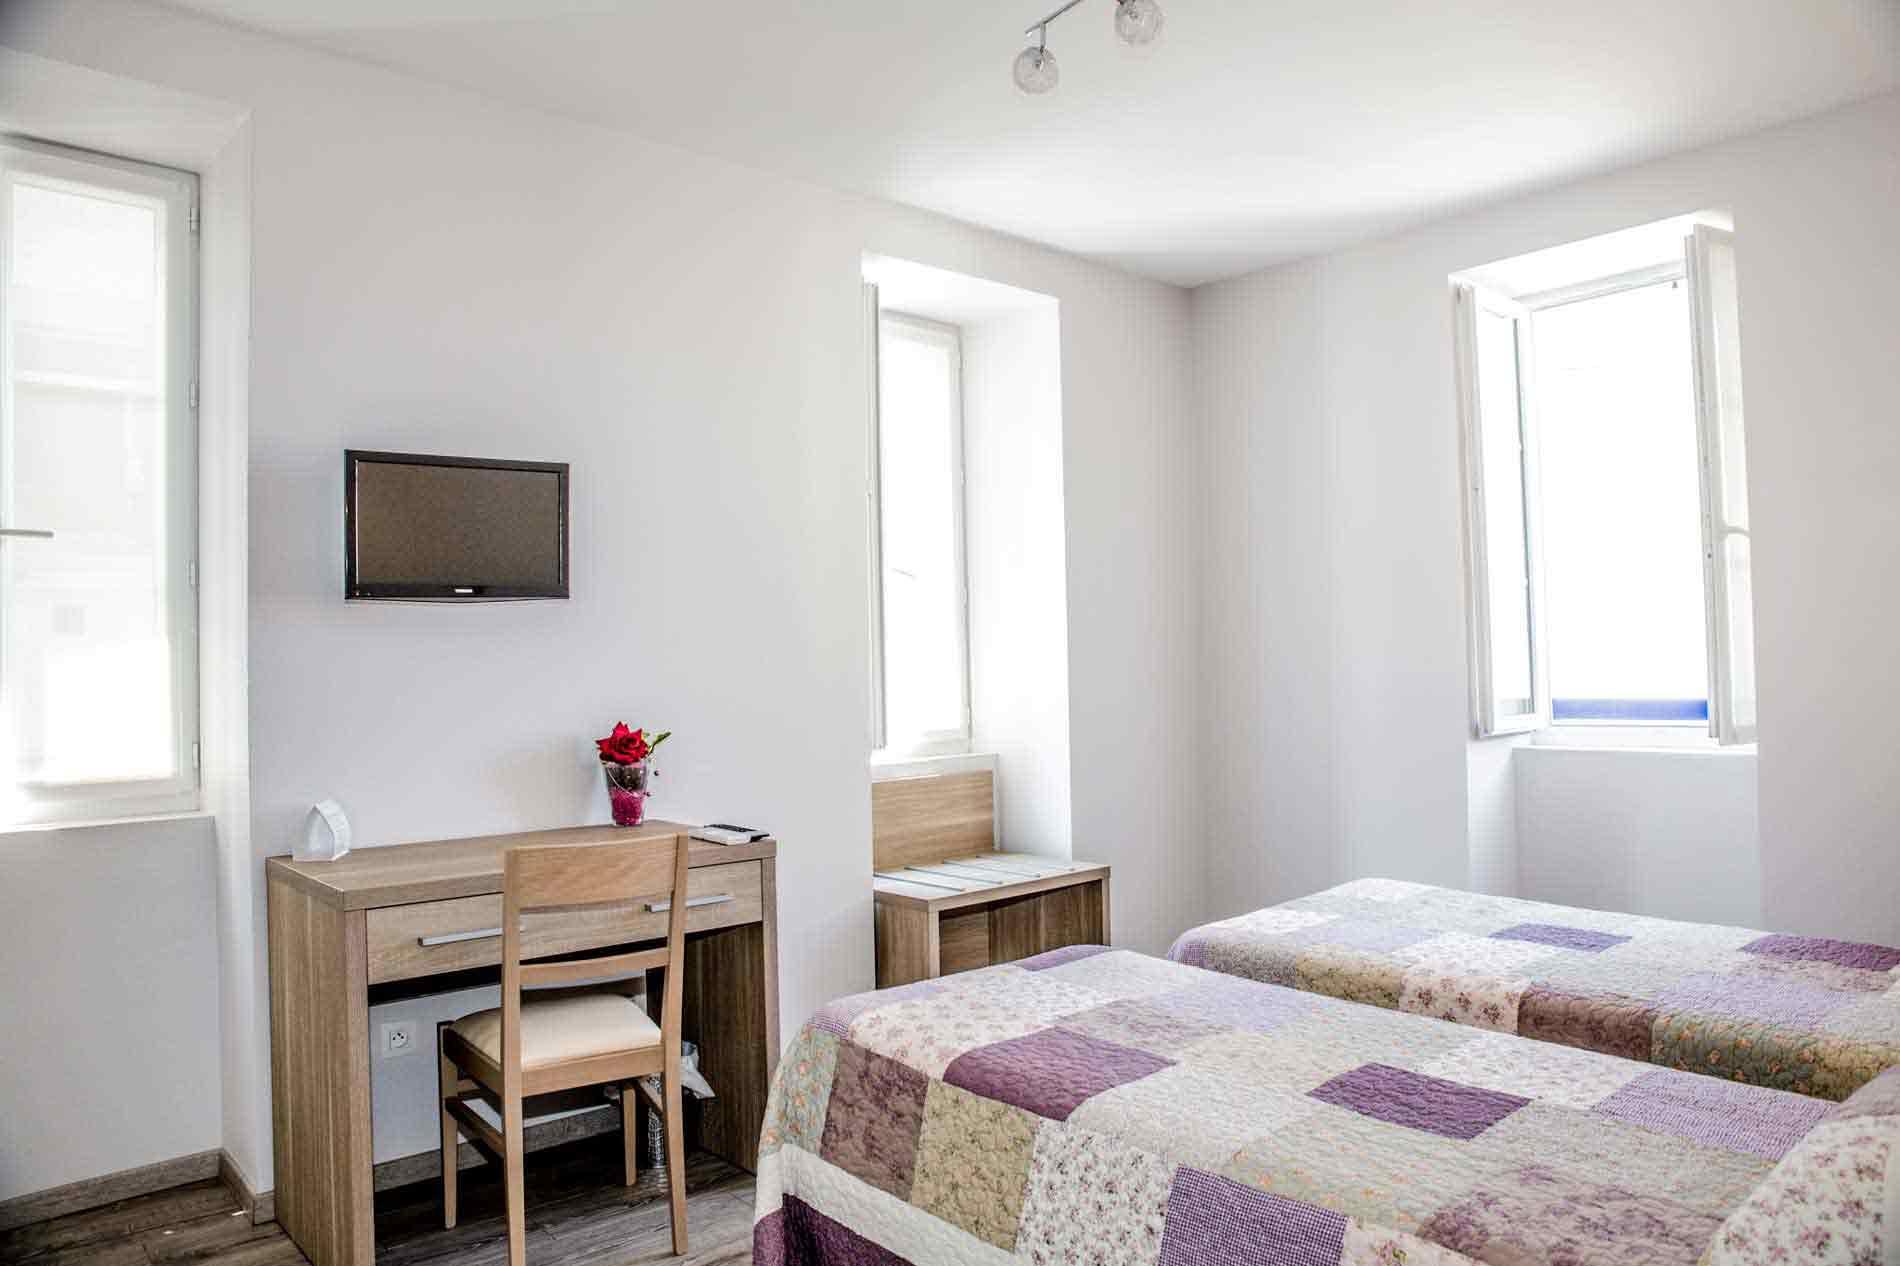 Des chambres confortables